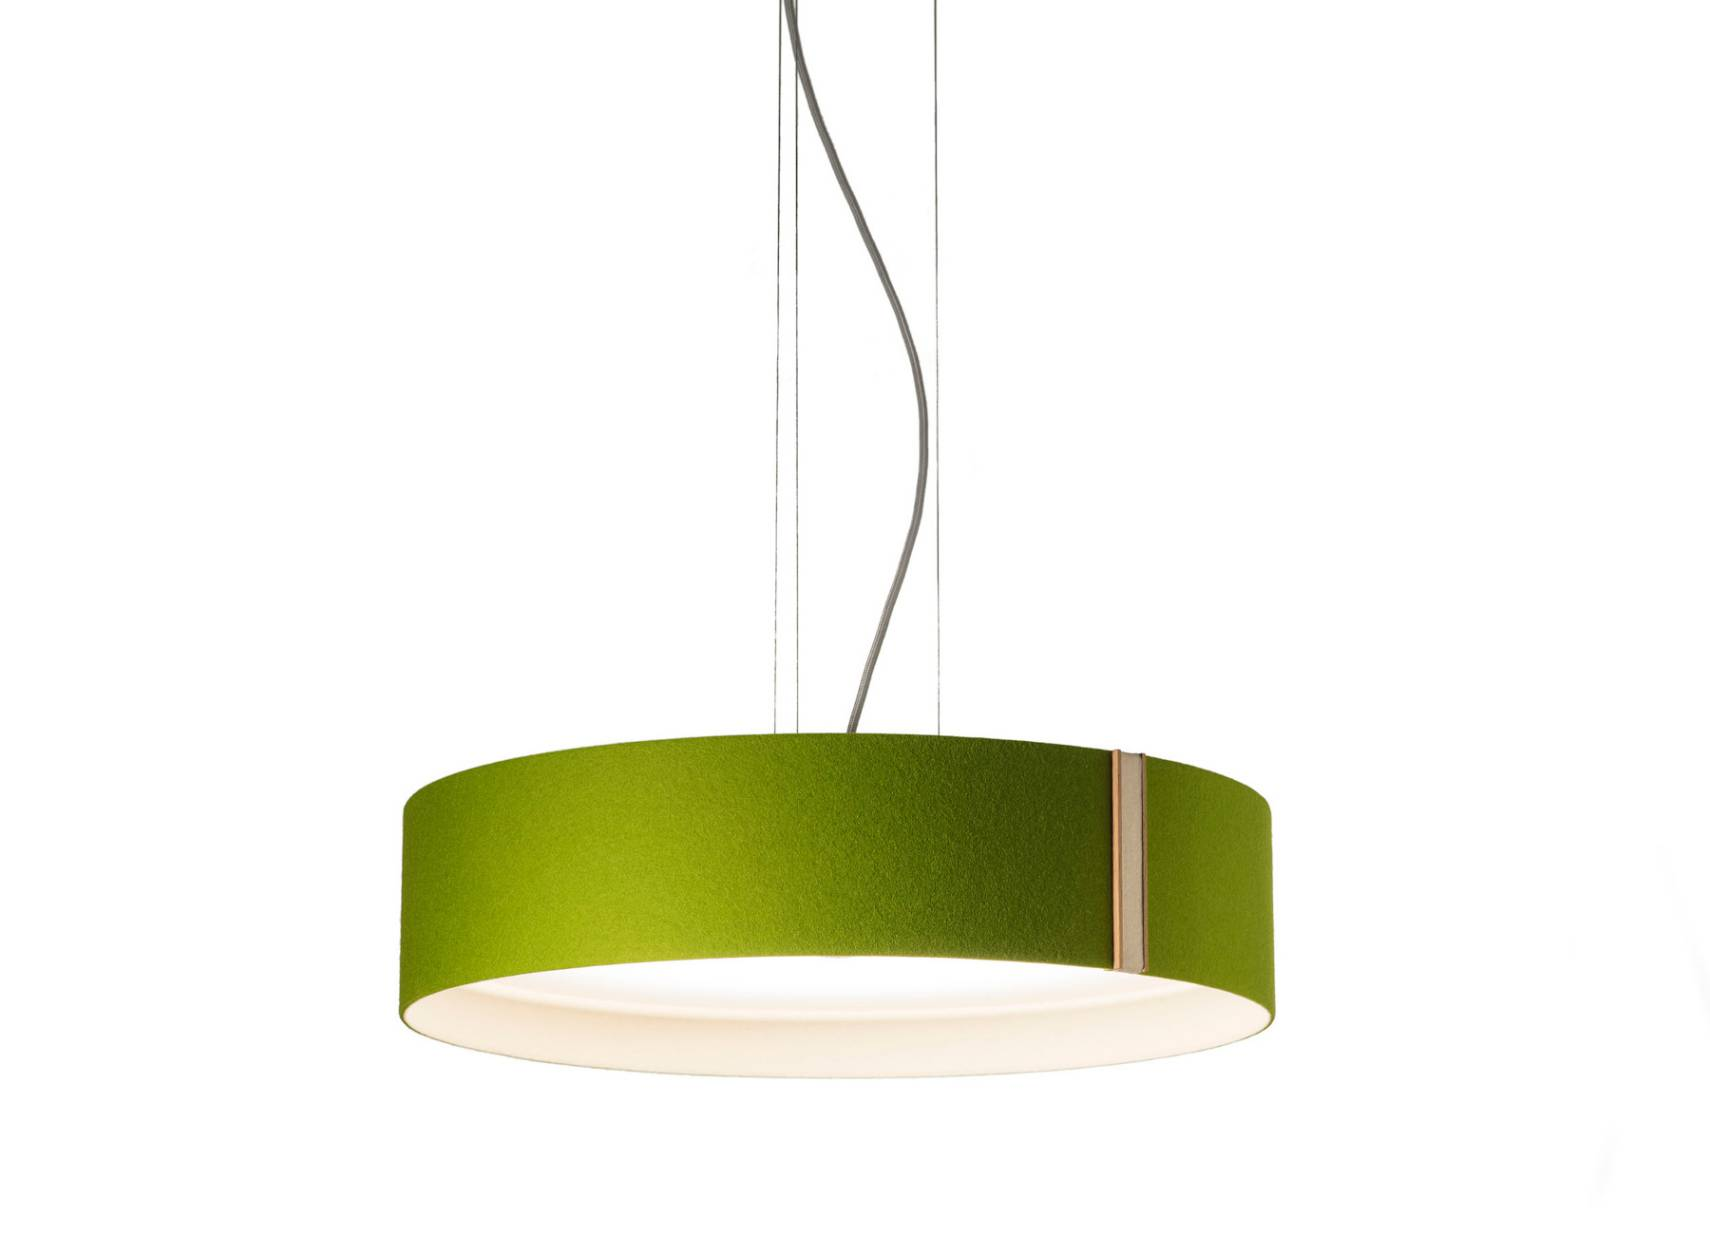 Domus Larafelt LED Pendelleuchte Design Leuchte